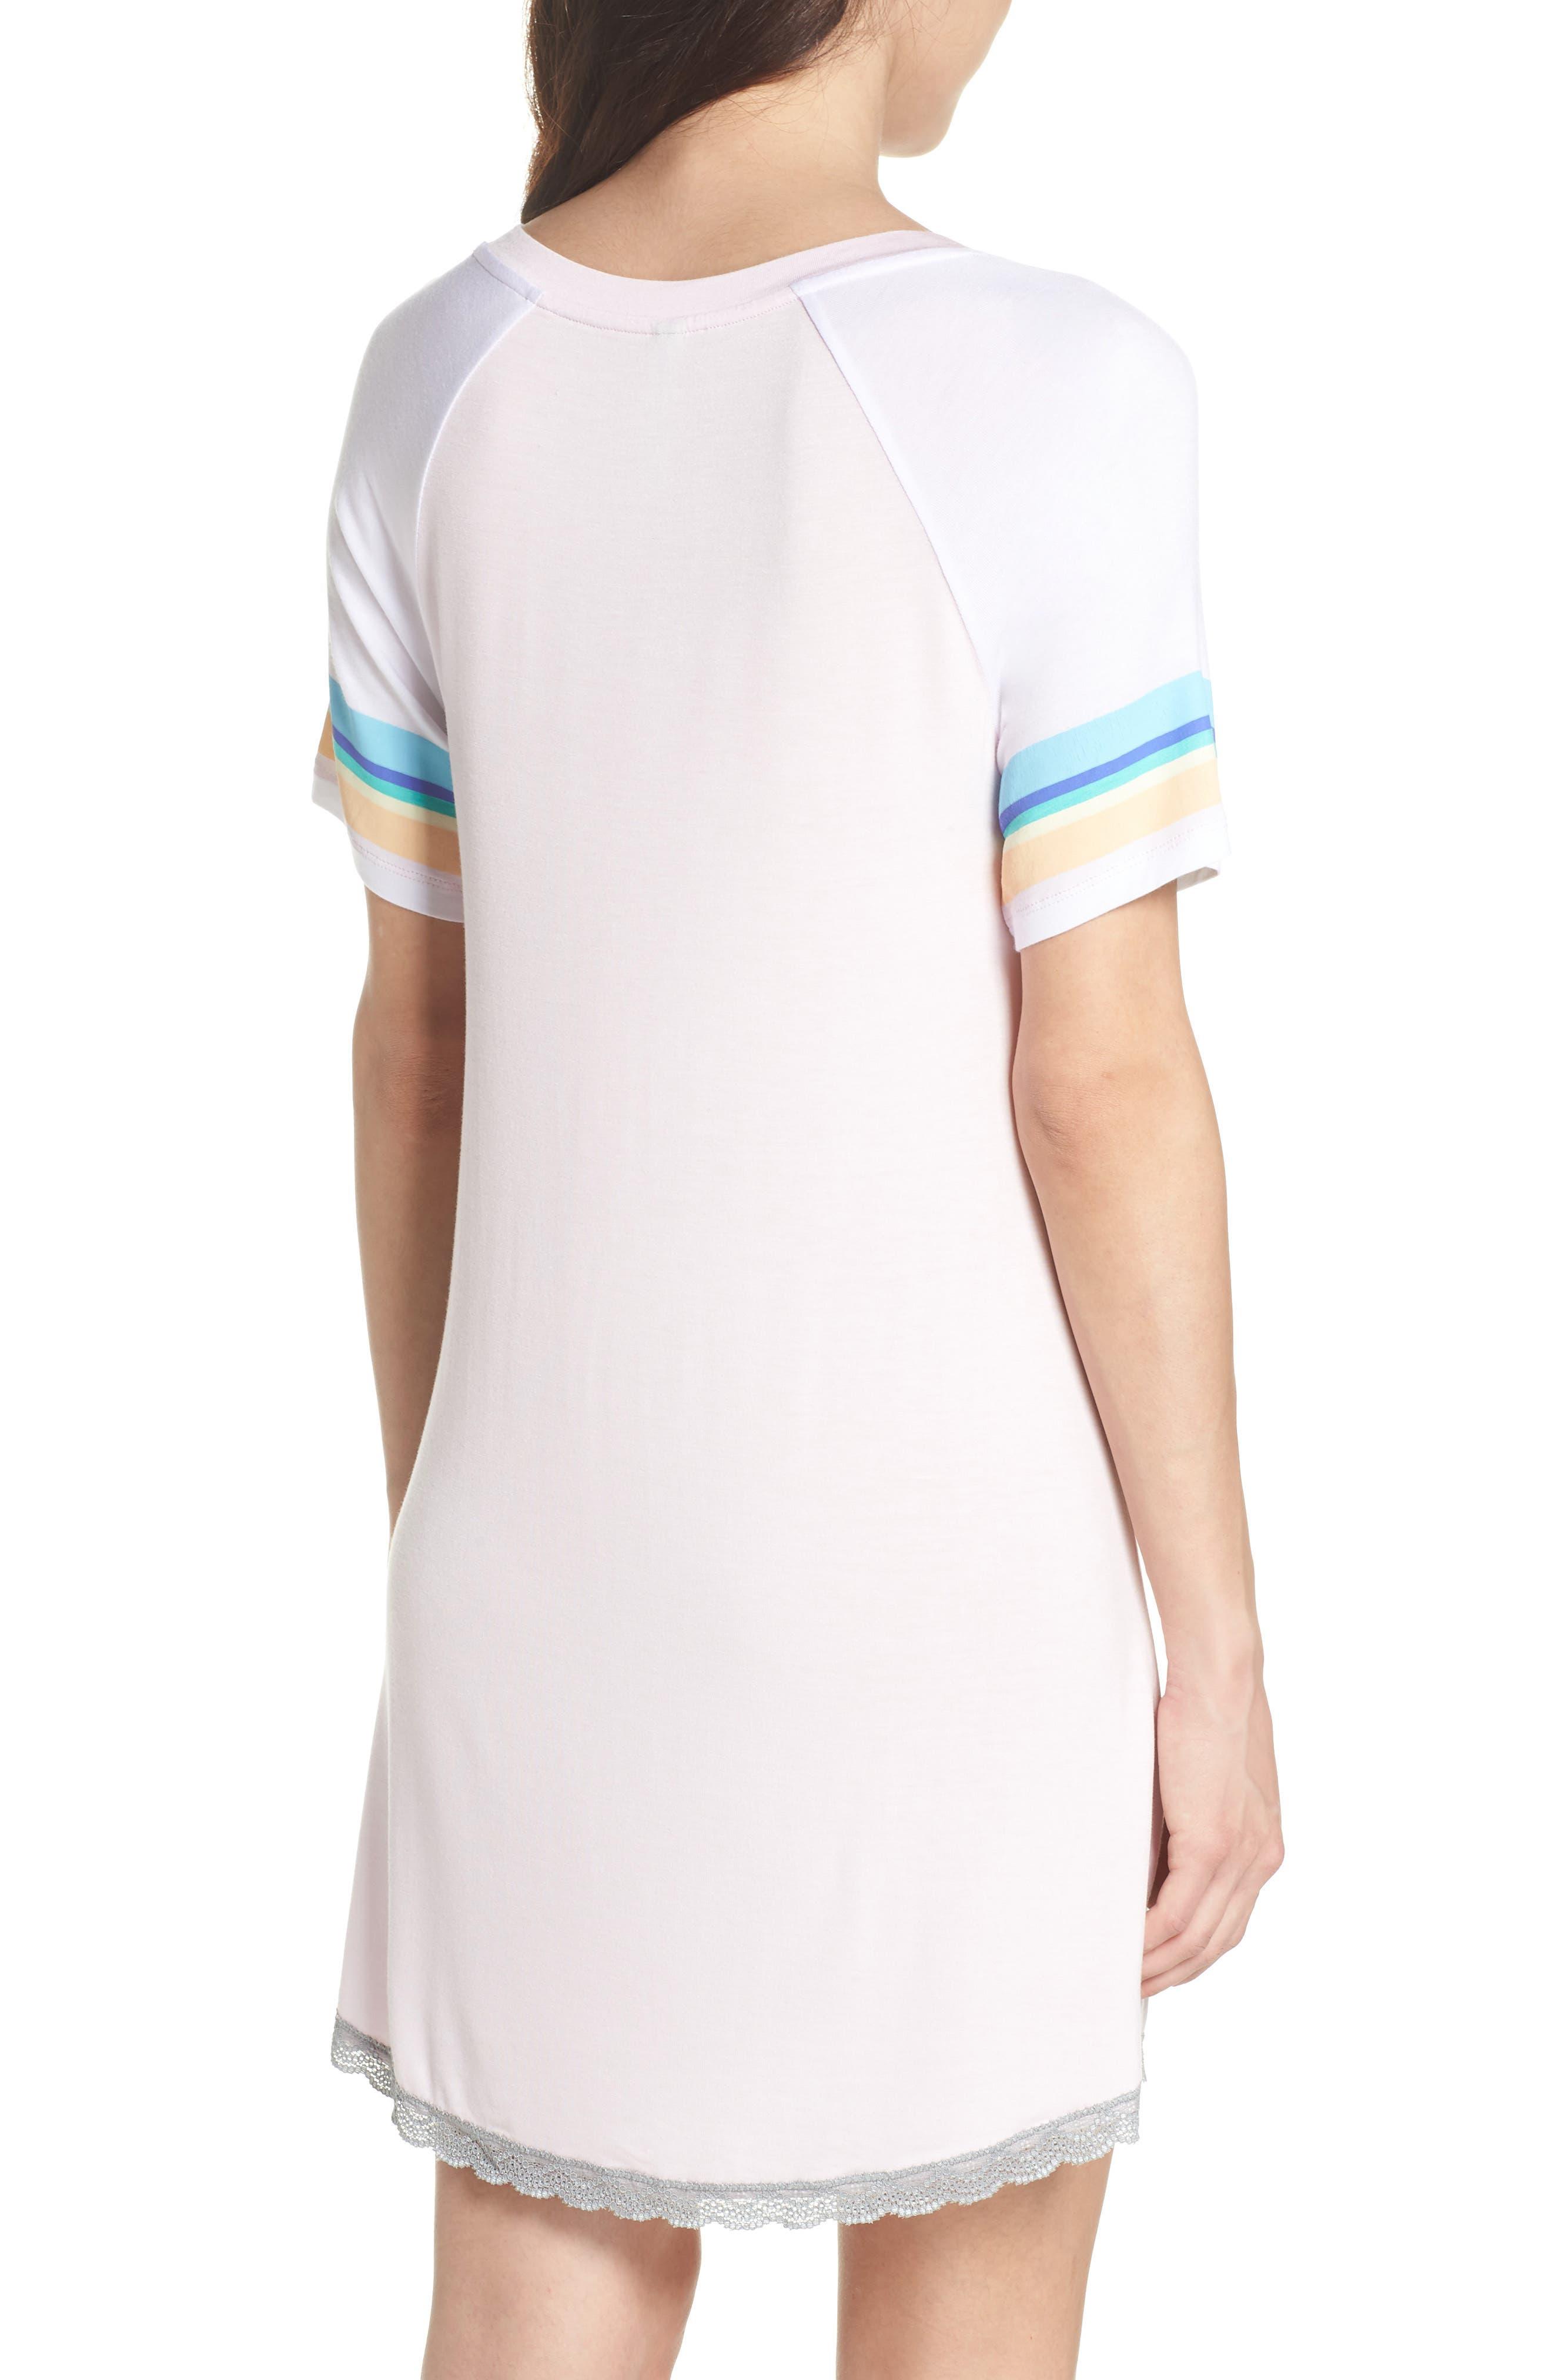 Honeydew Lace Trim Sleep Shirt,                             Alternate thumbnail 2, color,                             Cherry Soda